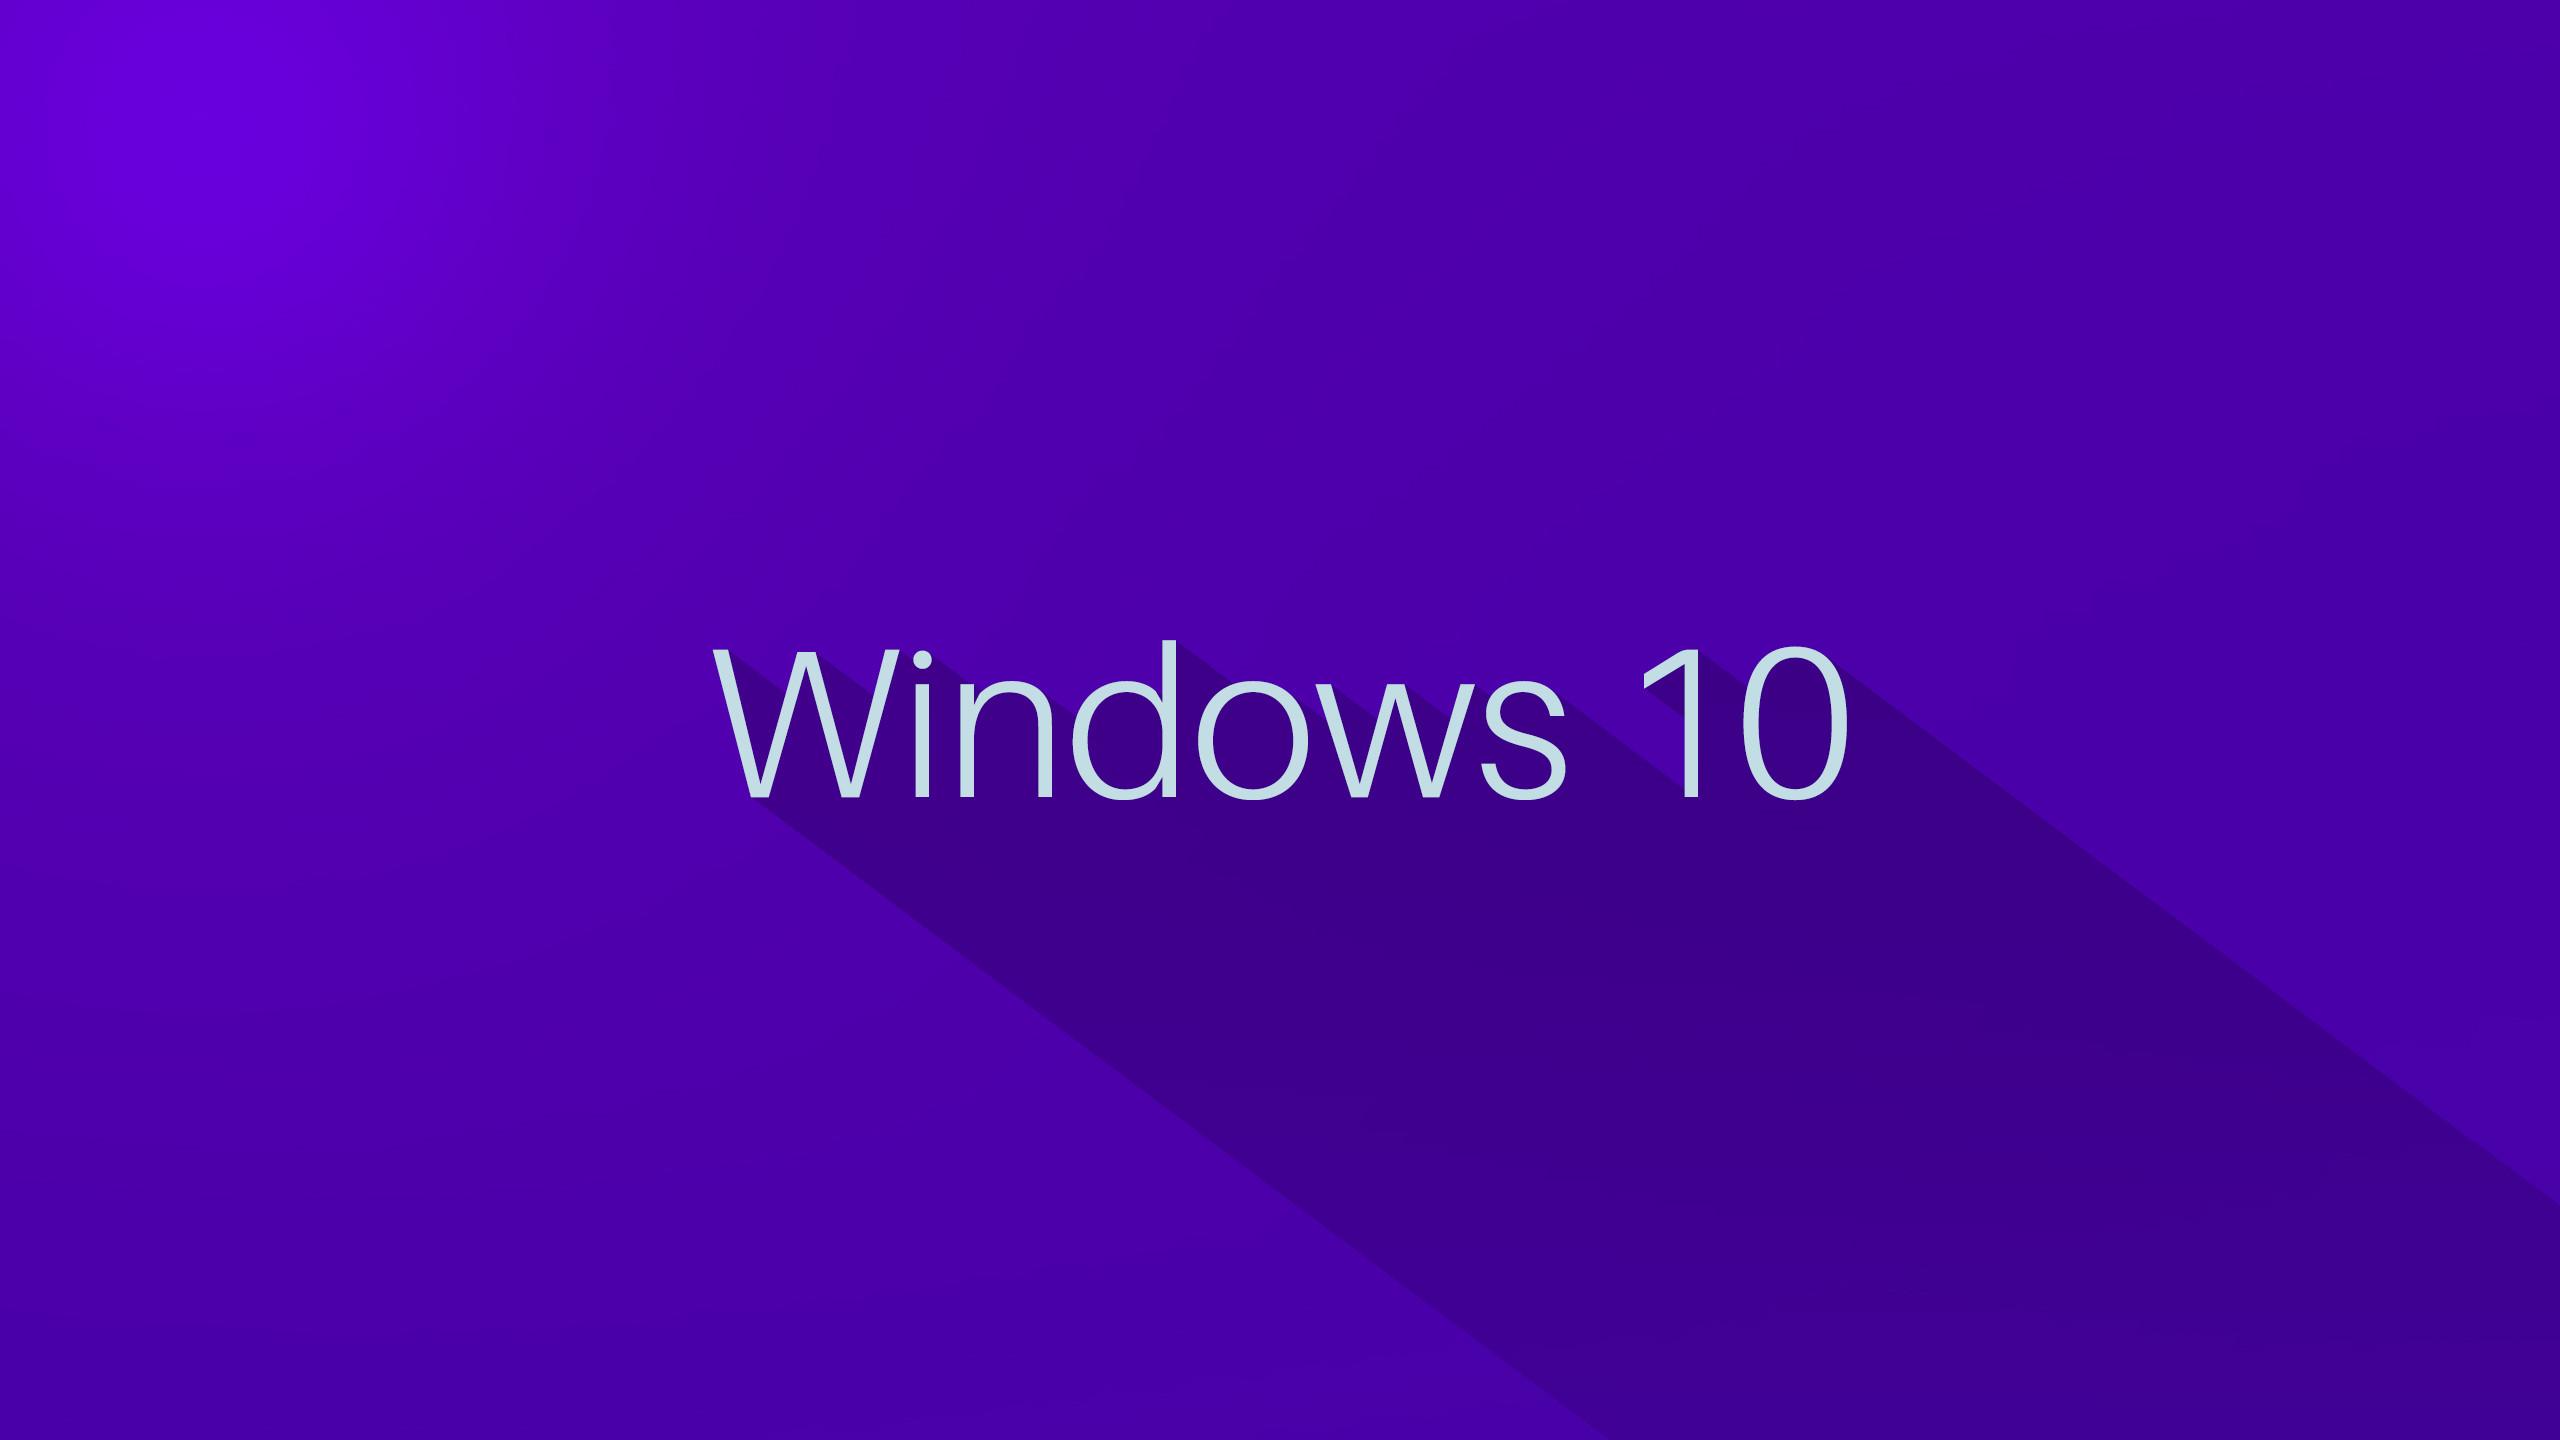 Windows-10-Wallpaper-1080p-Full-HD-Logo-on-